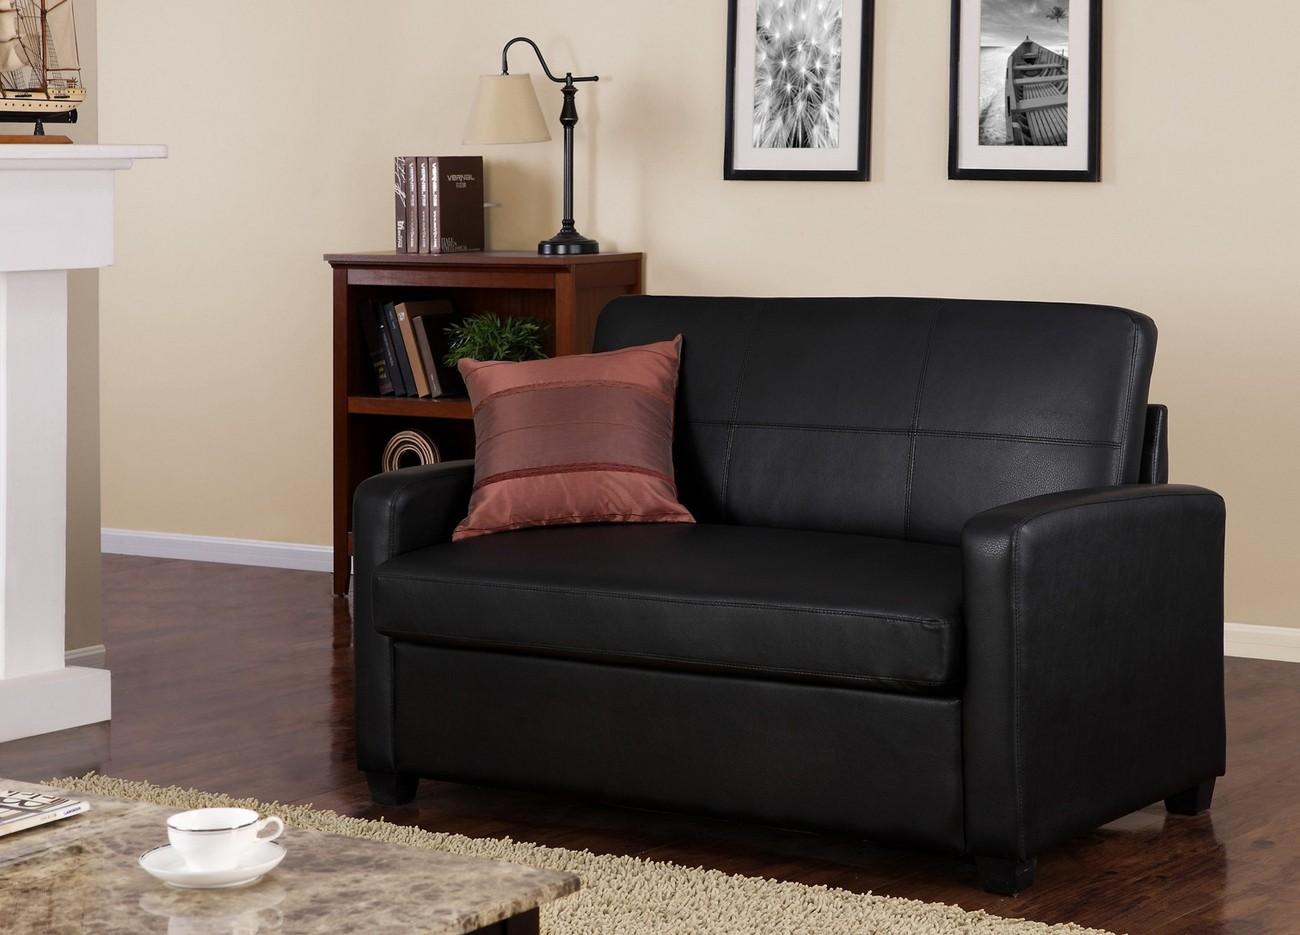 Sofa Black Single Sleeper Chair With Pillow